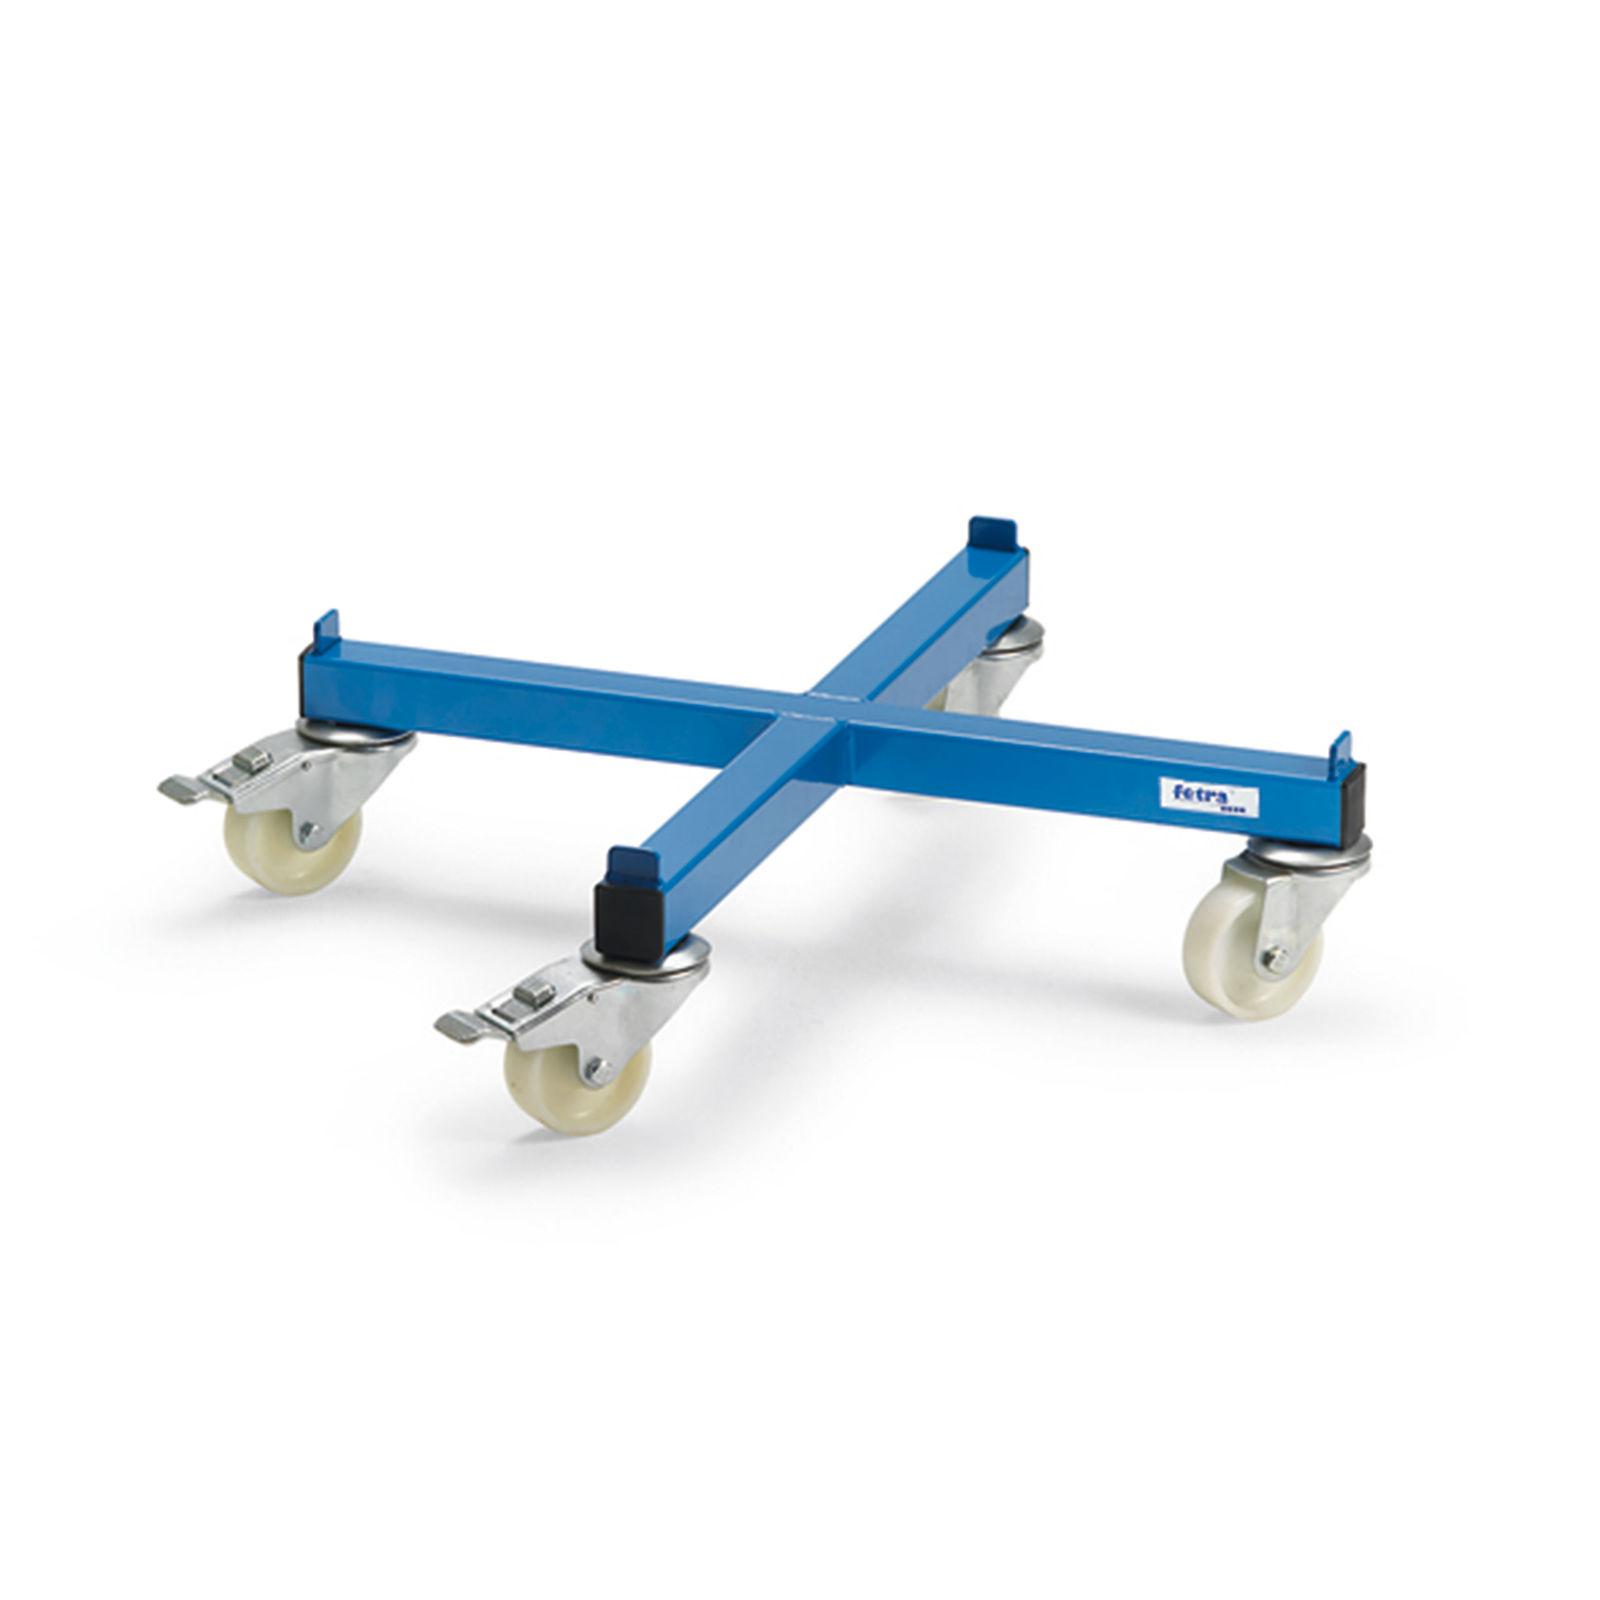 Fassroller fassroller roller transportsysteme for Boden katalog anfordern